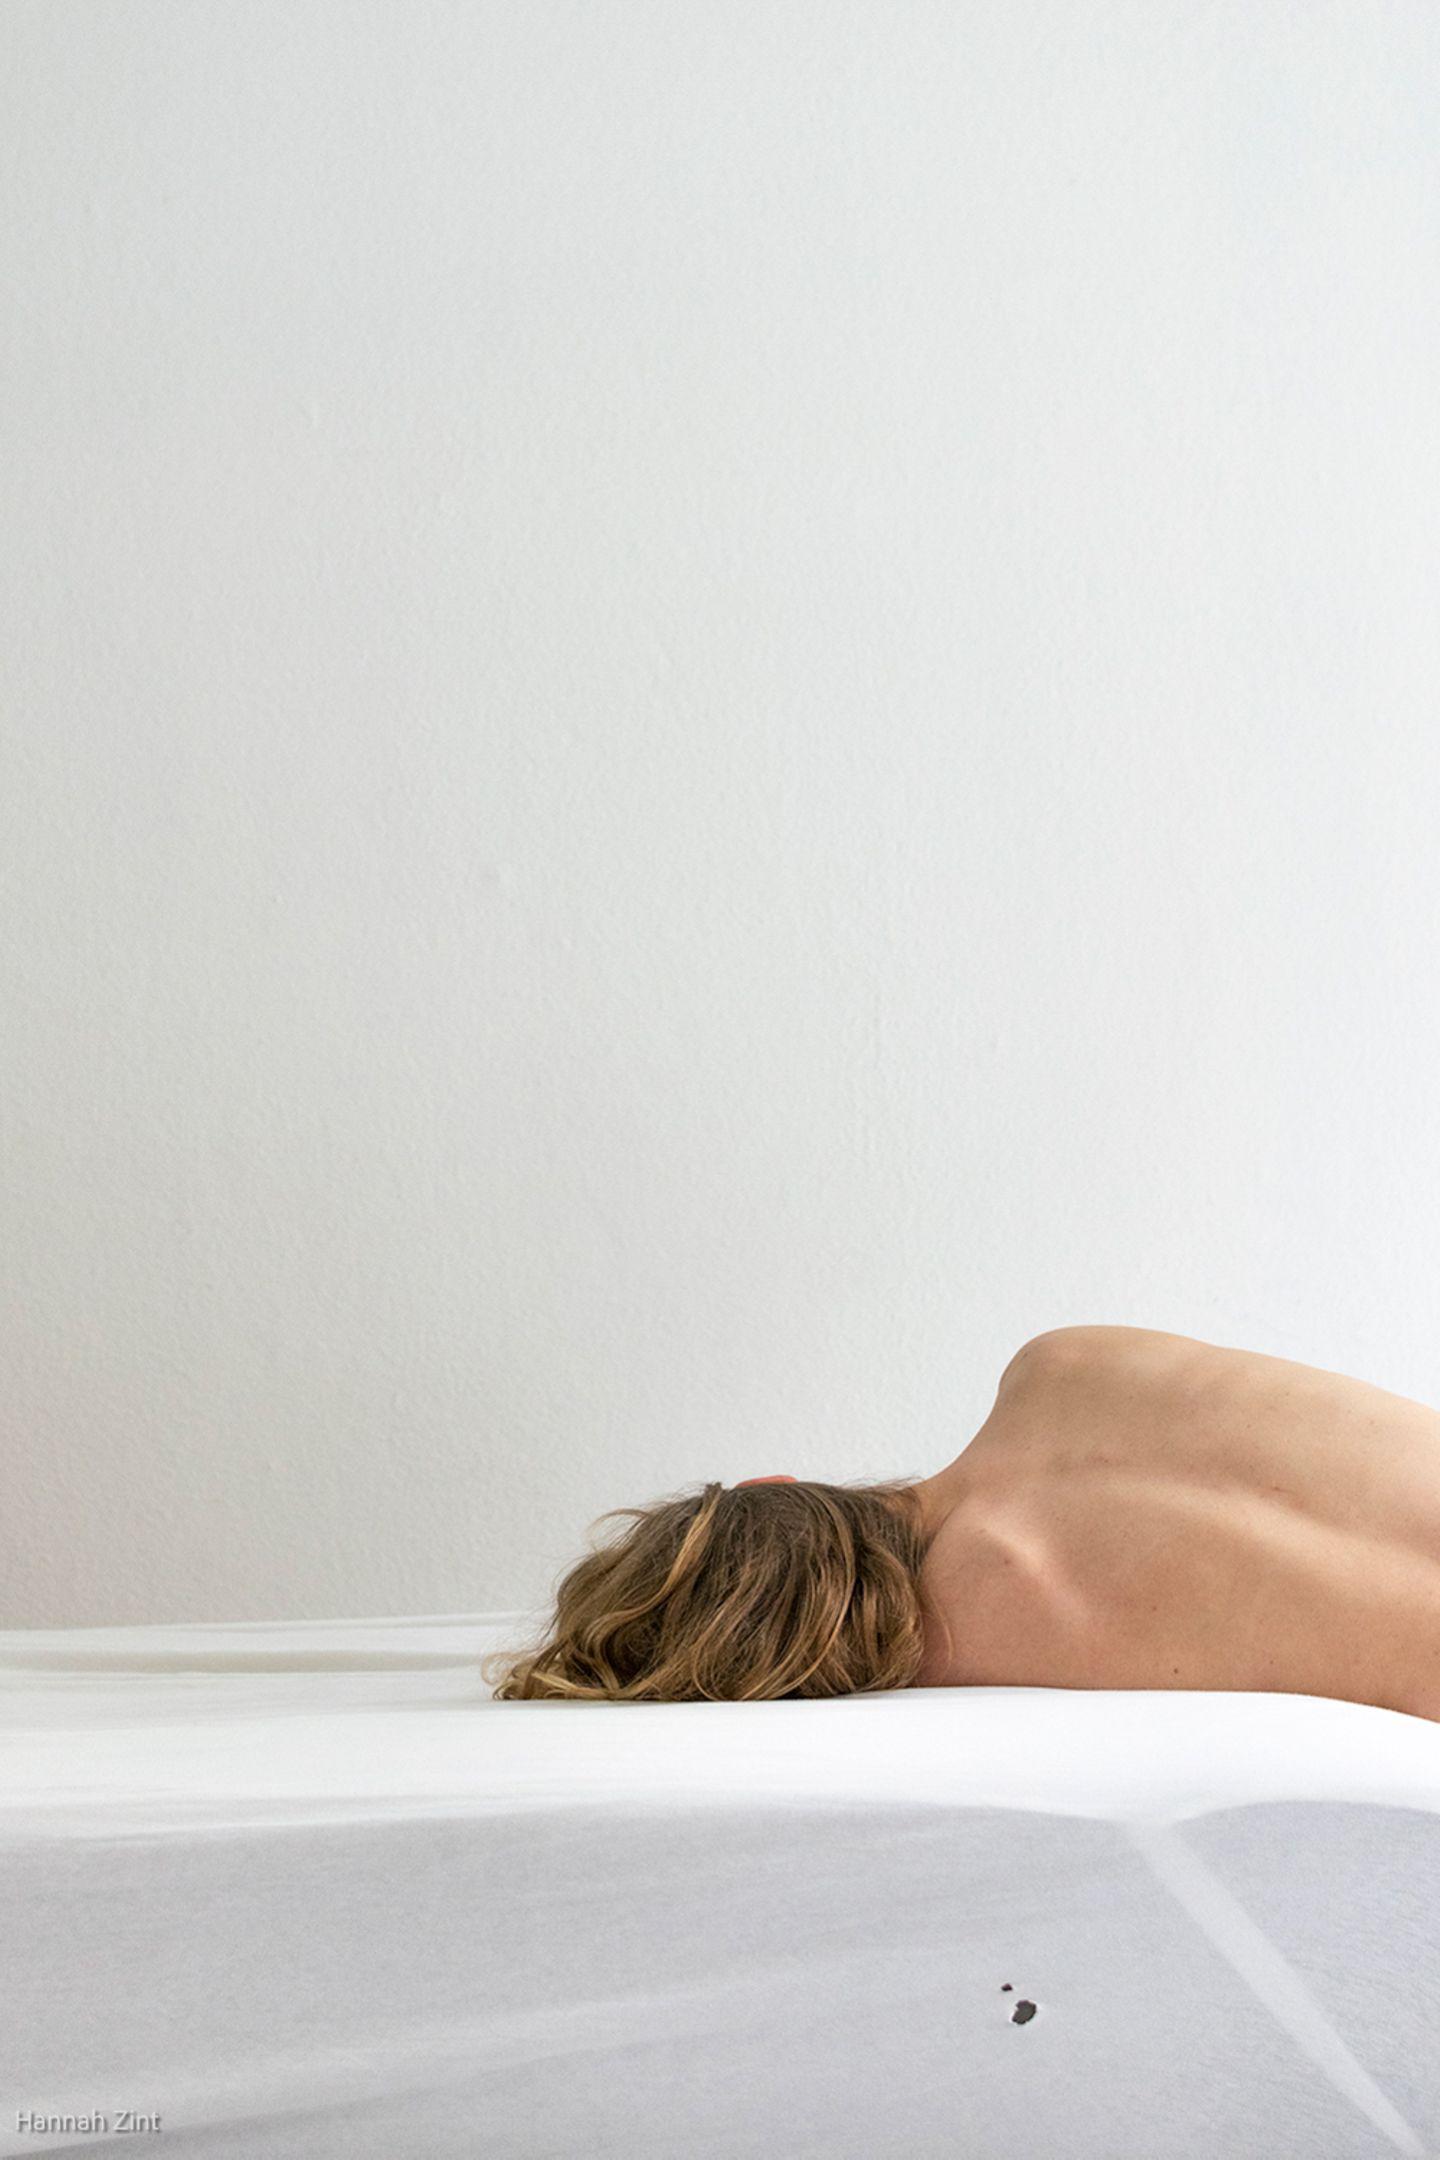 Endometriose in Bildern: Frau auf Bett